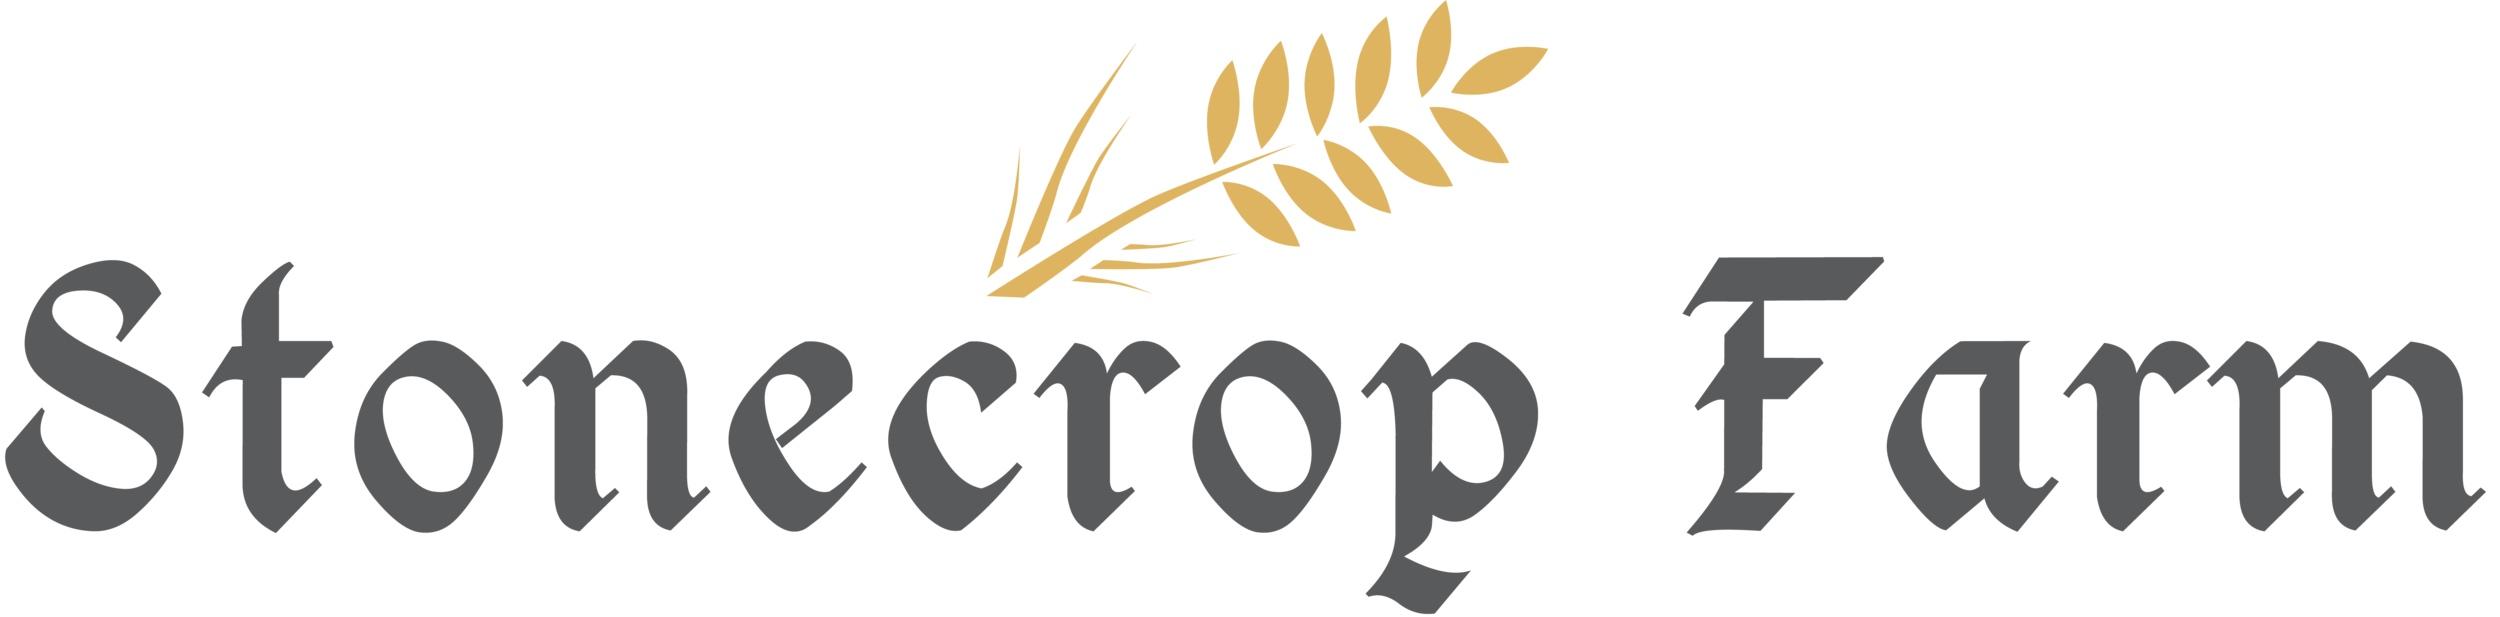 Stonecrop+Farm+Logo+_+595a5a+Gray+w.+Wheat-1.jpg